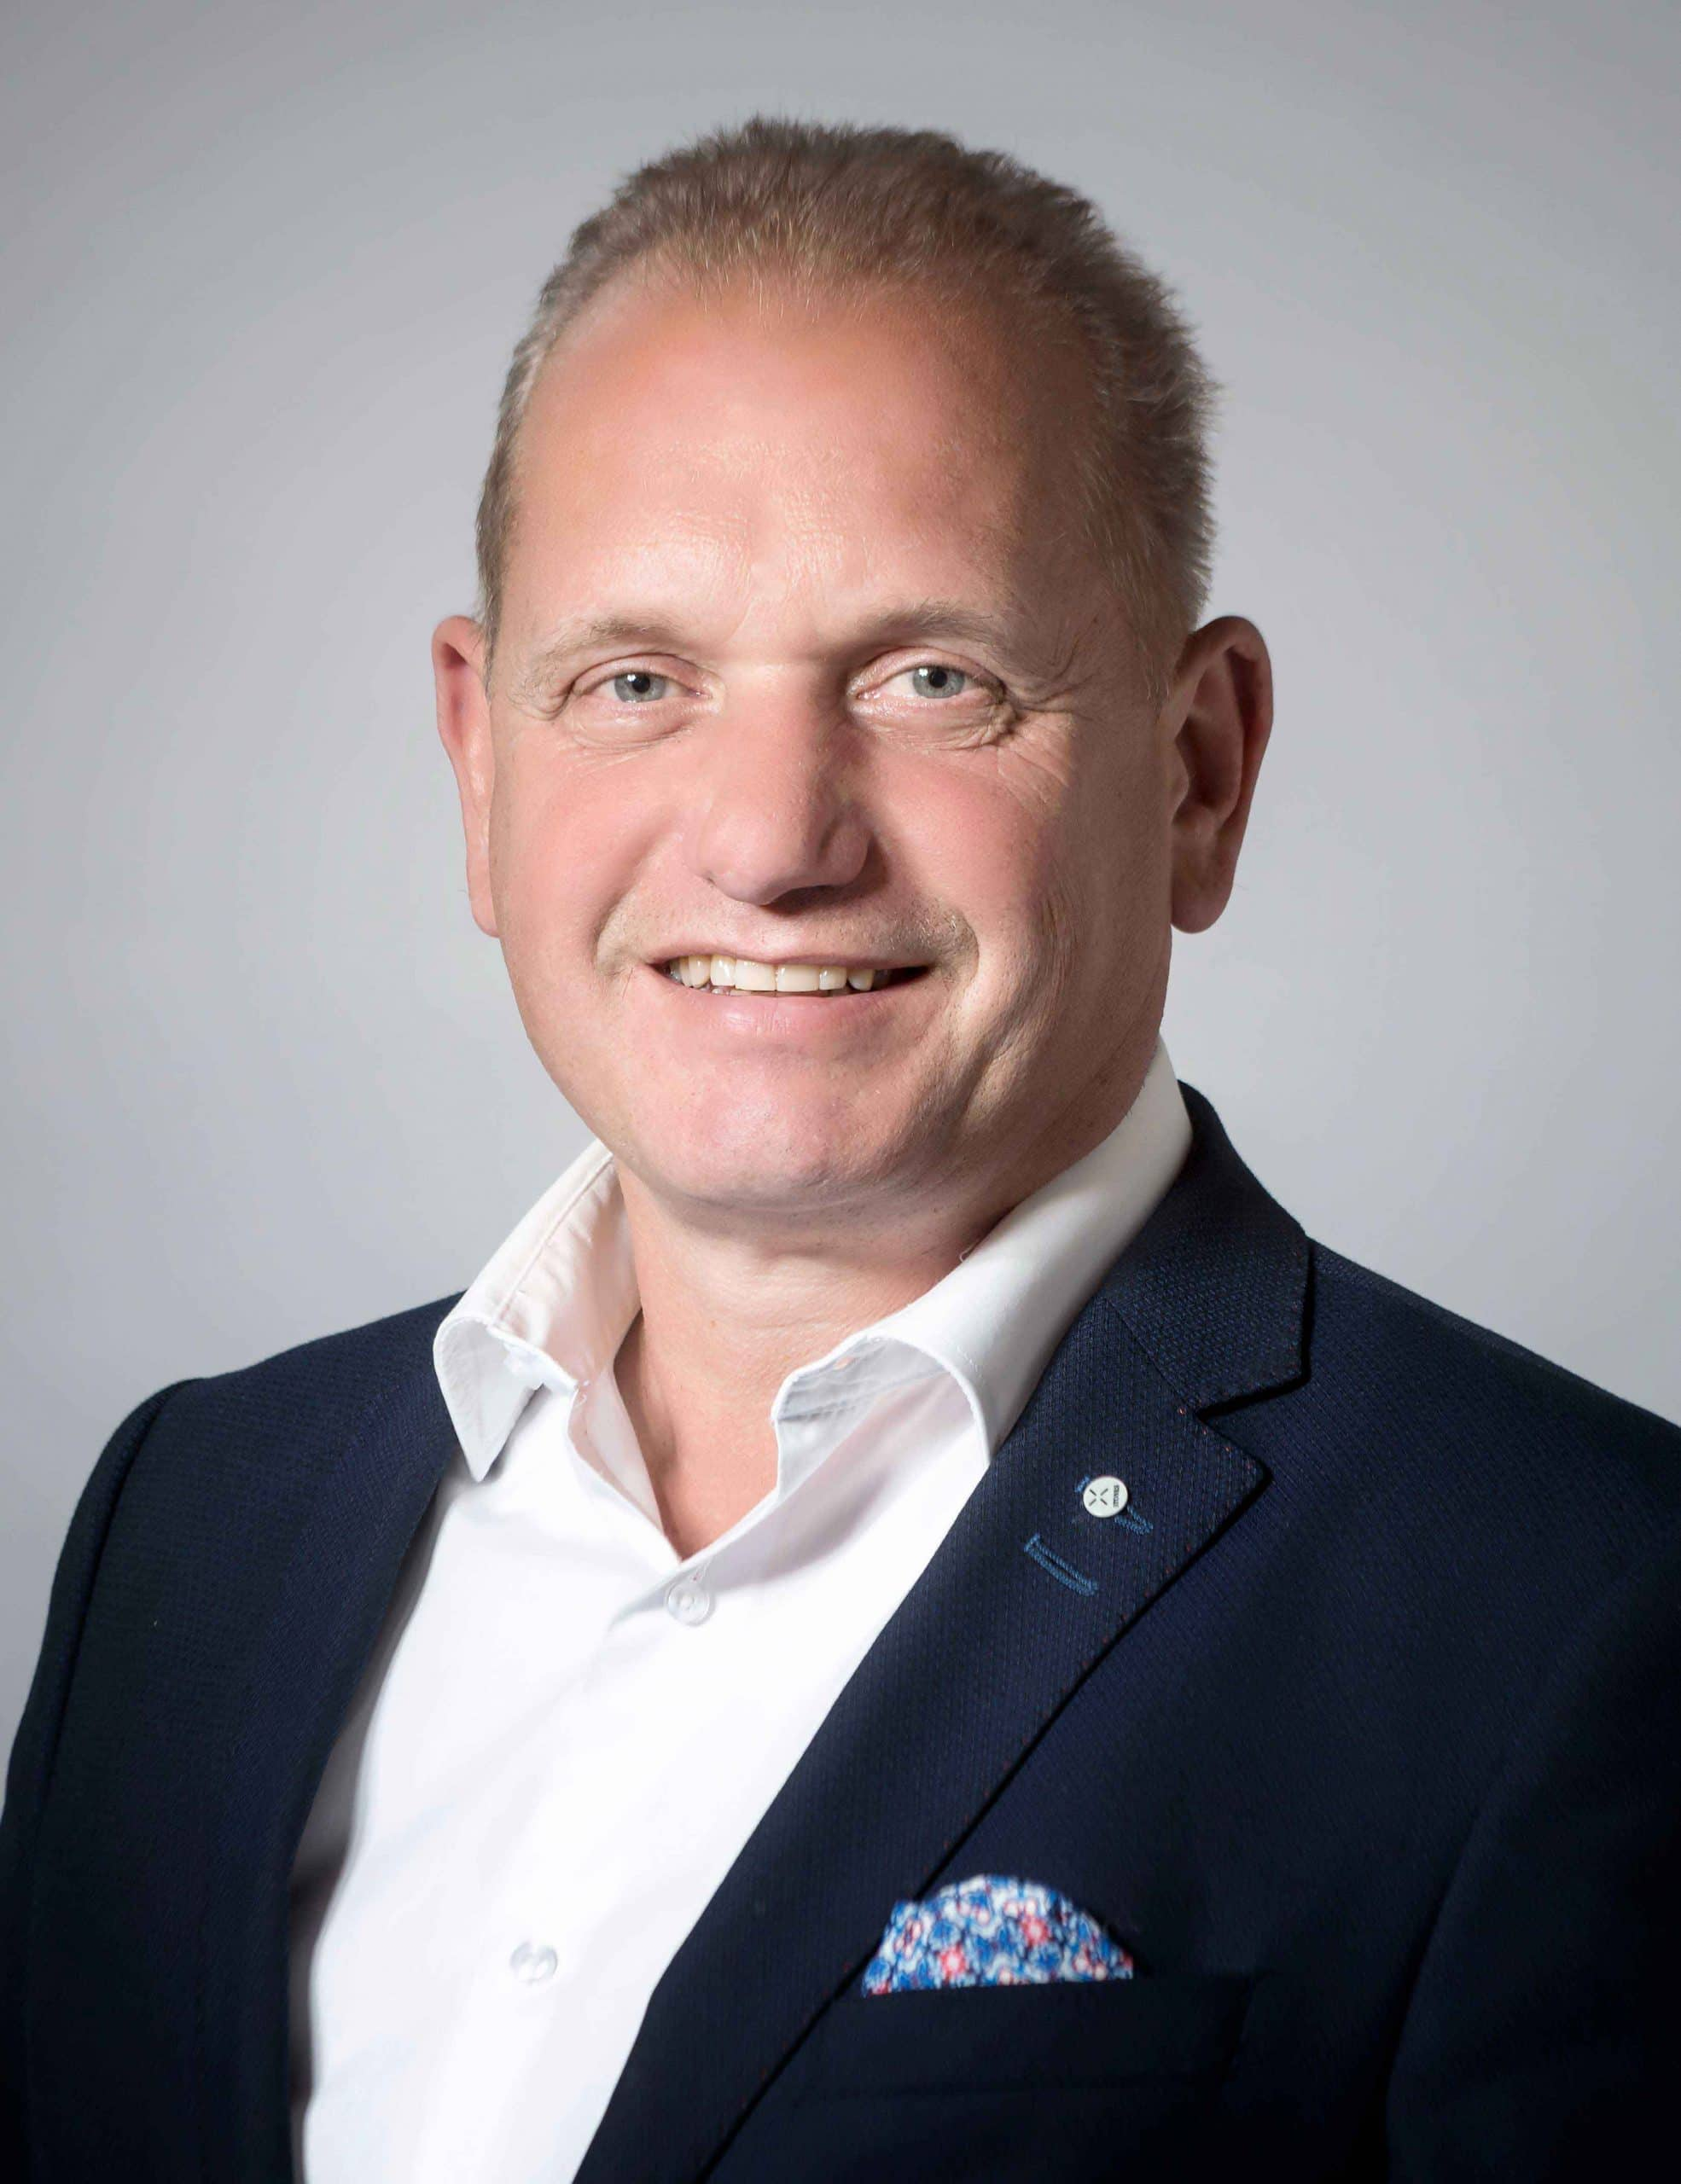 cygnus geert-jan Berning financieringsspecialist nijmegen